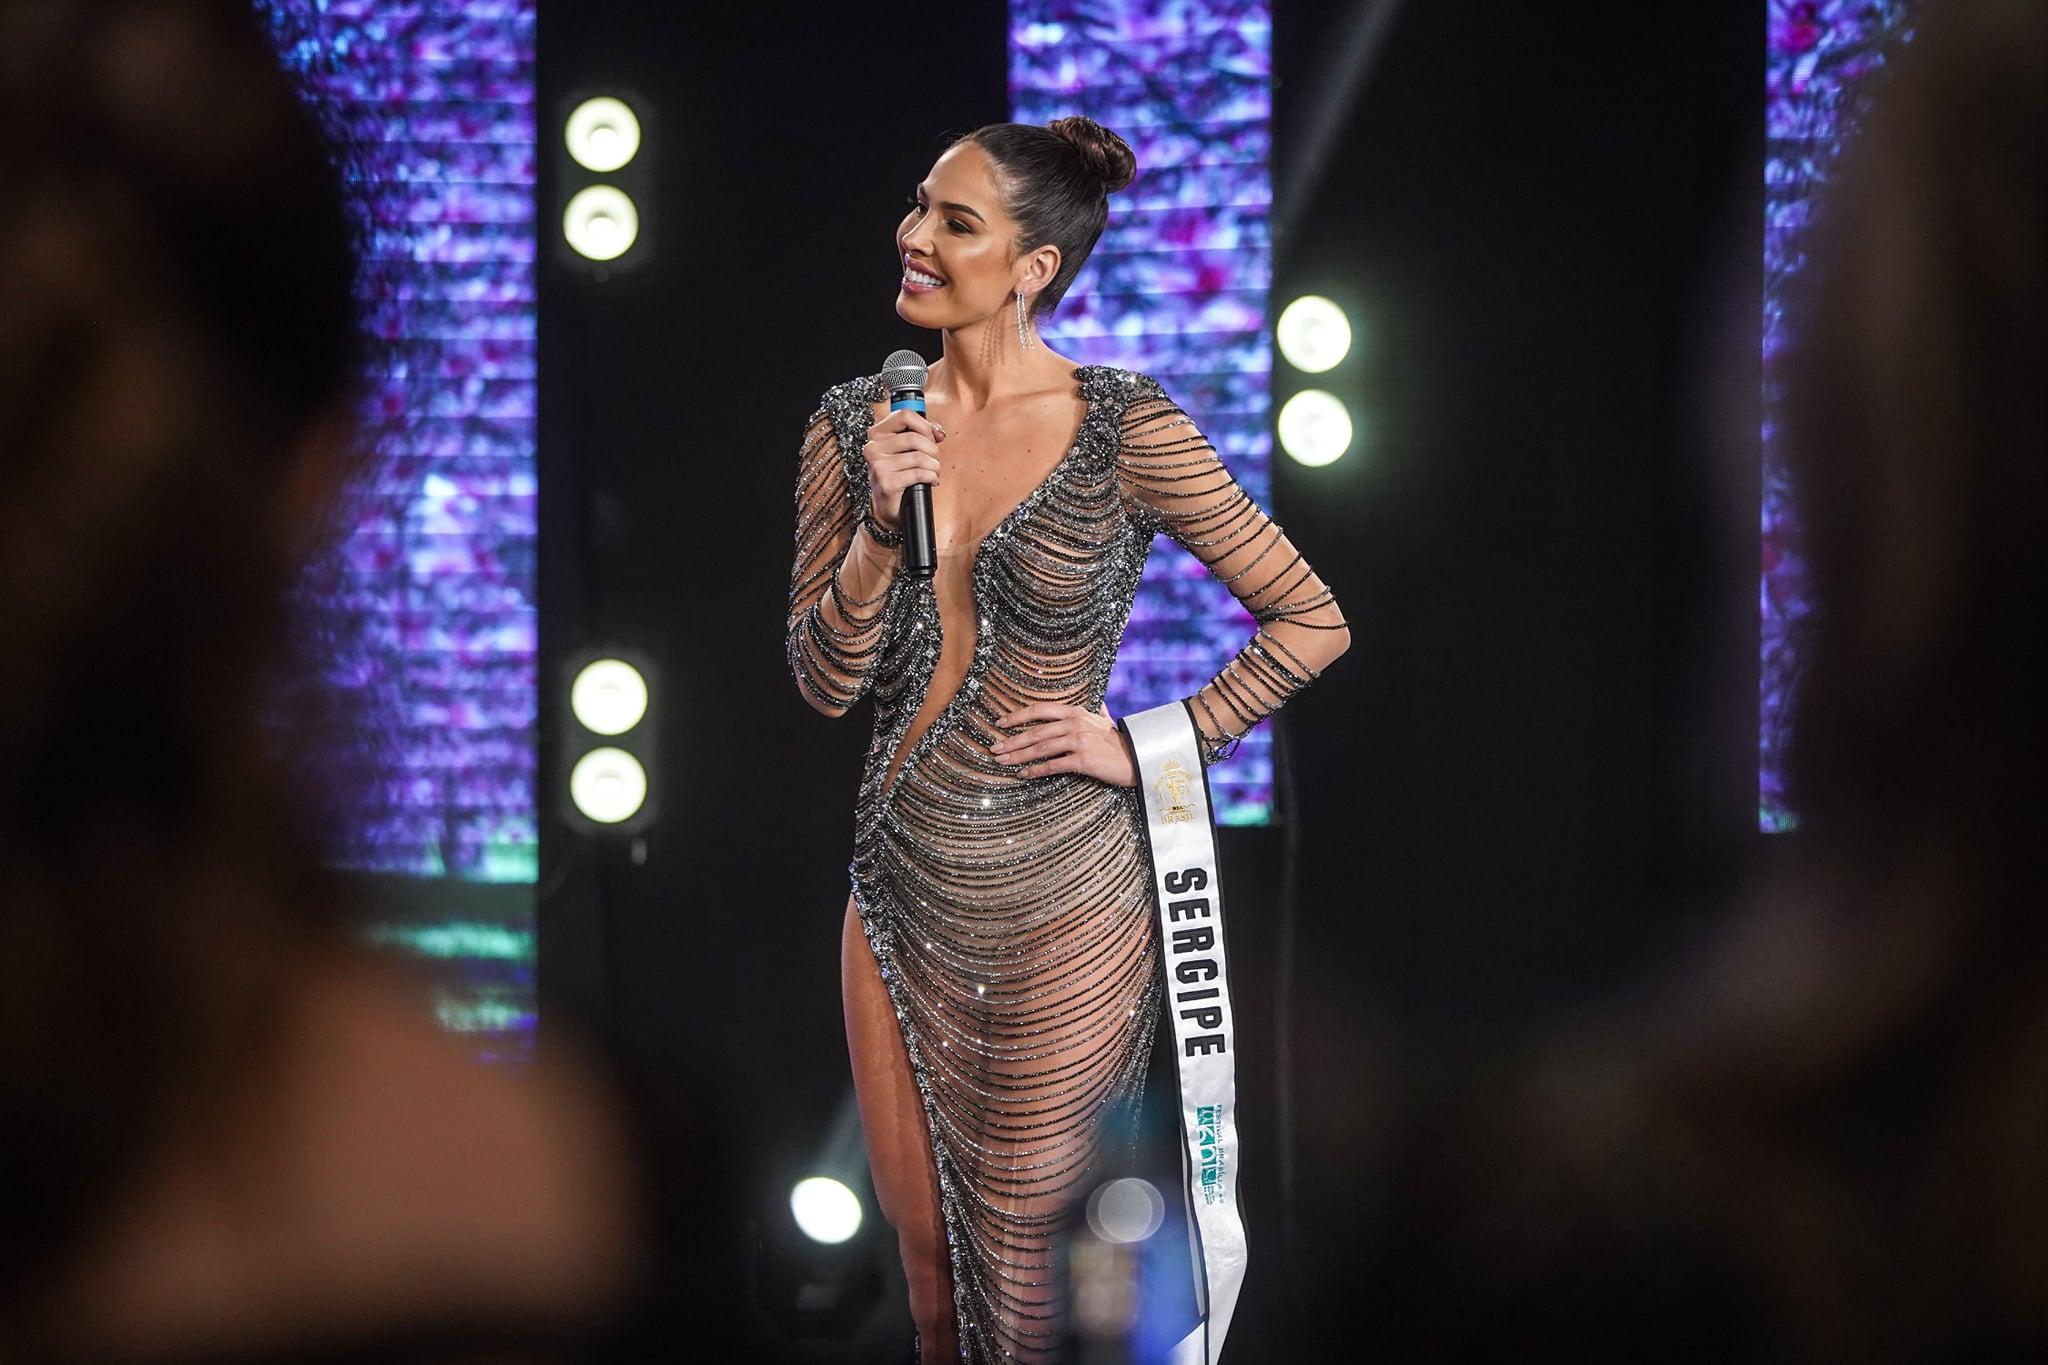 bruna zanardo, 1st runner-up de miss supranational brazil 2020/miss brasil internacional 2017/miss brasil terra 2016. - Página 19 12965211